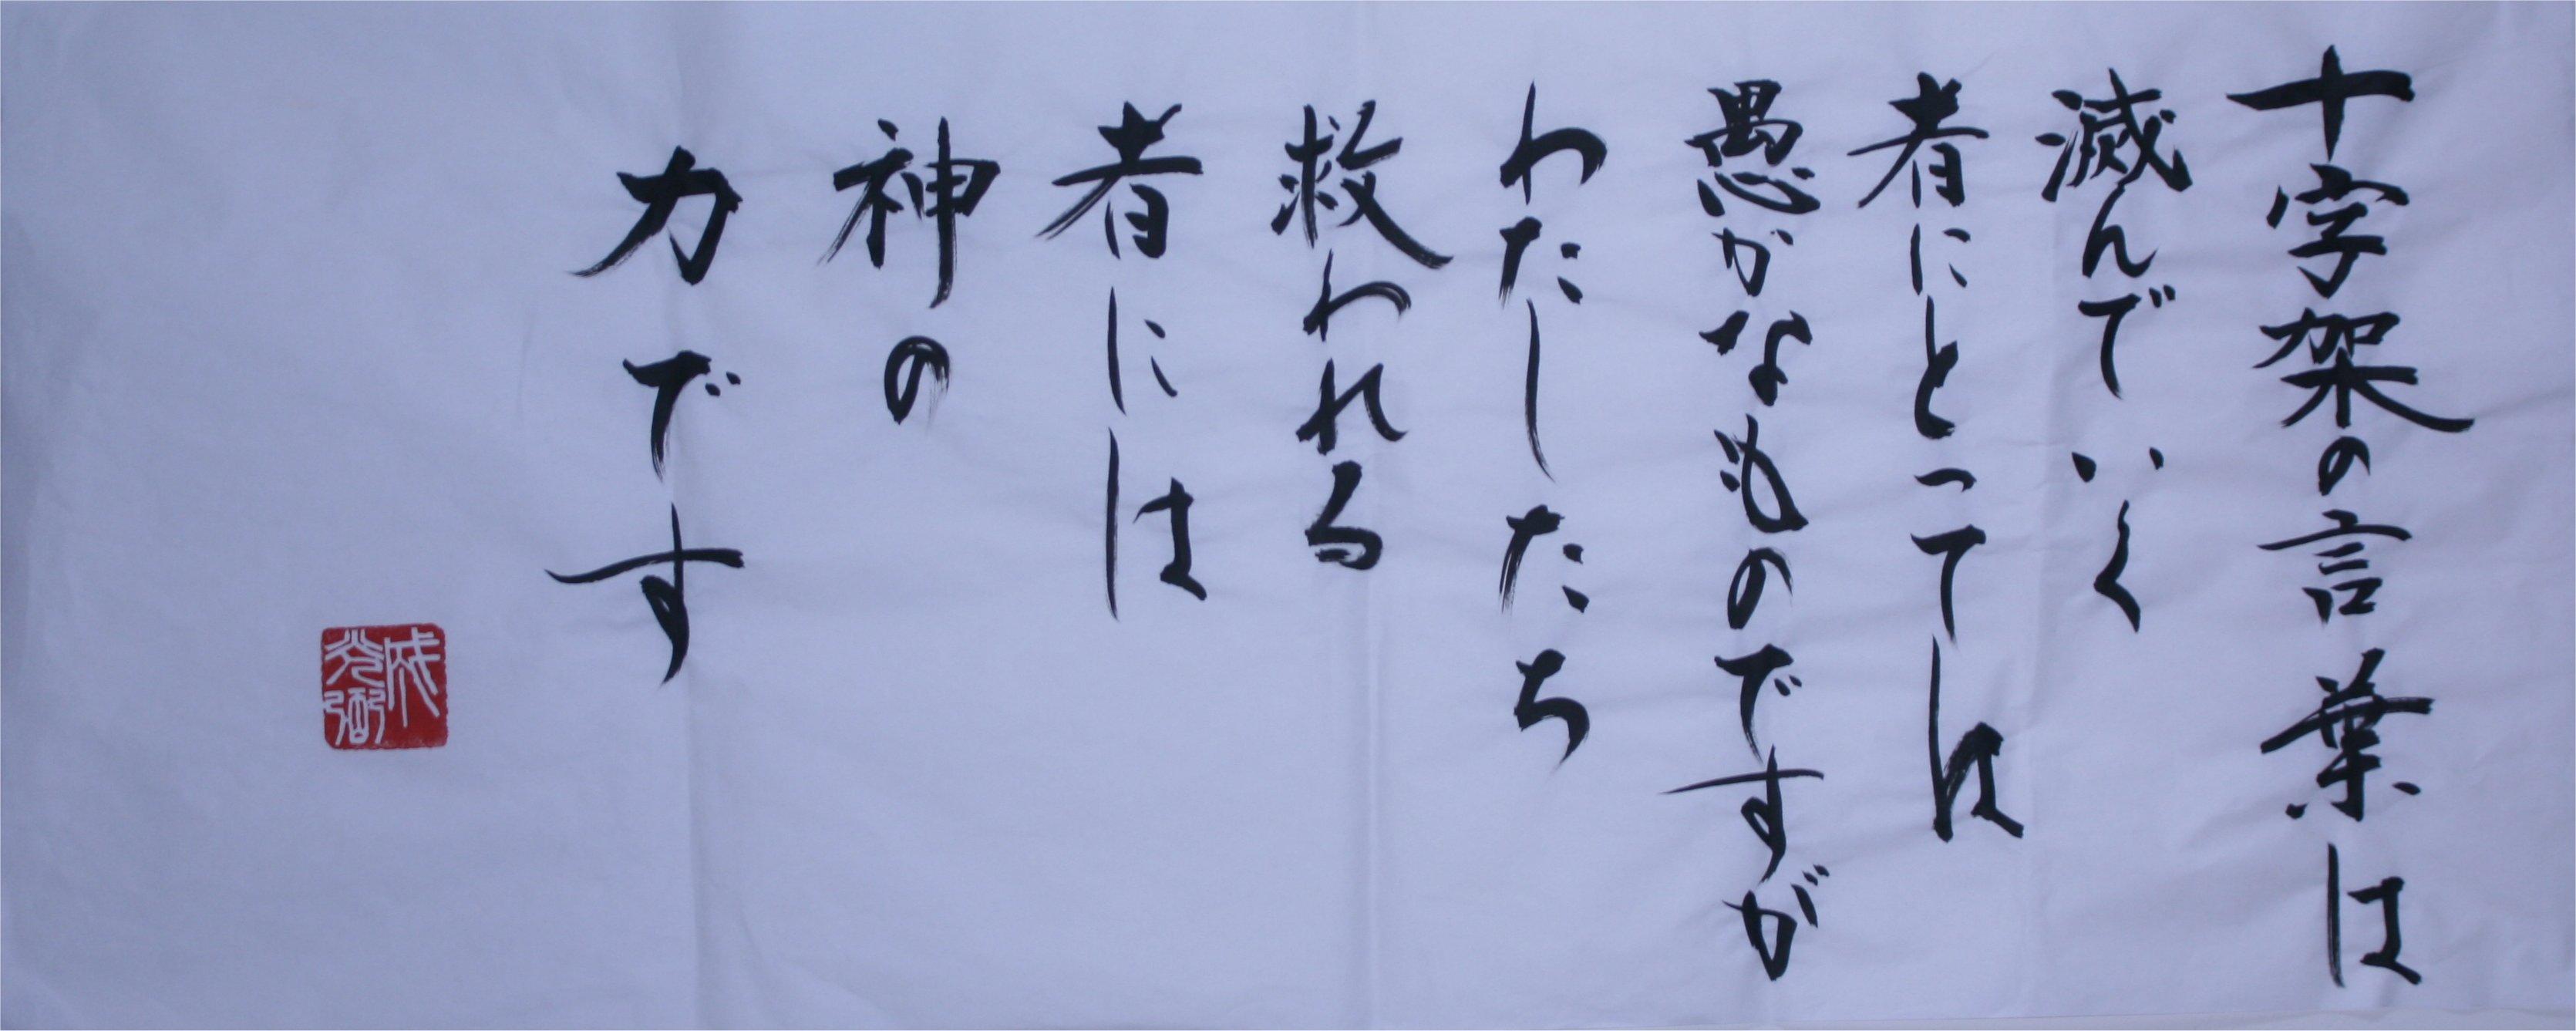 cross_calligraphy.jpg